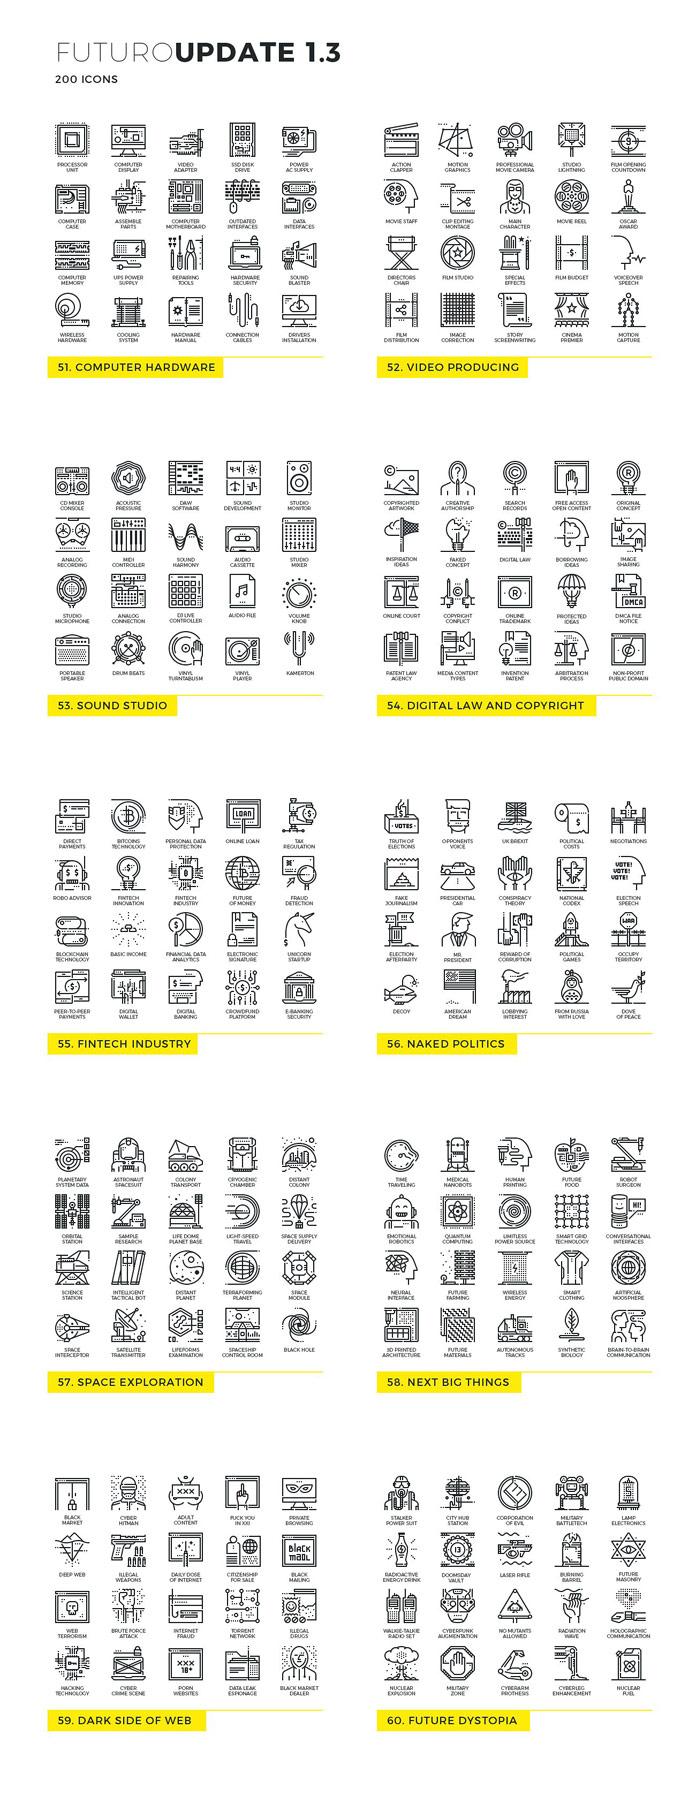 Futuro line icons - Update 3